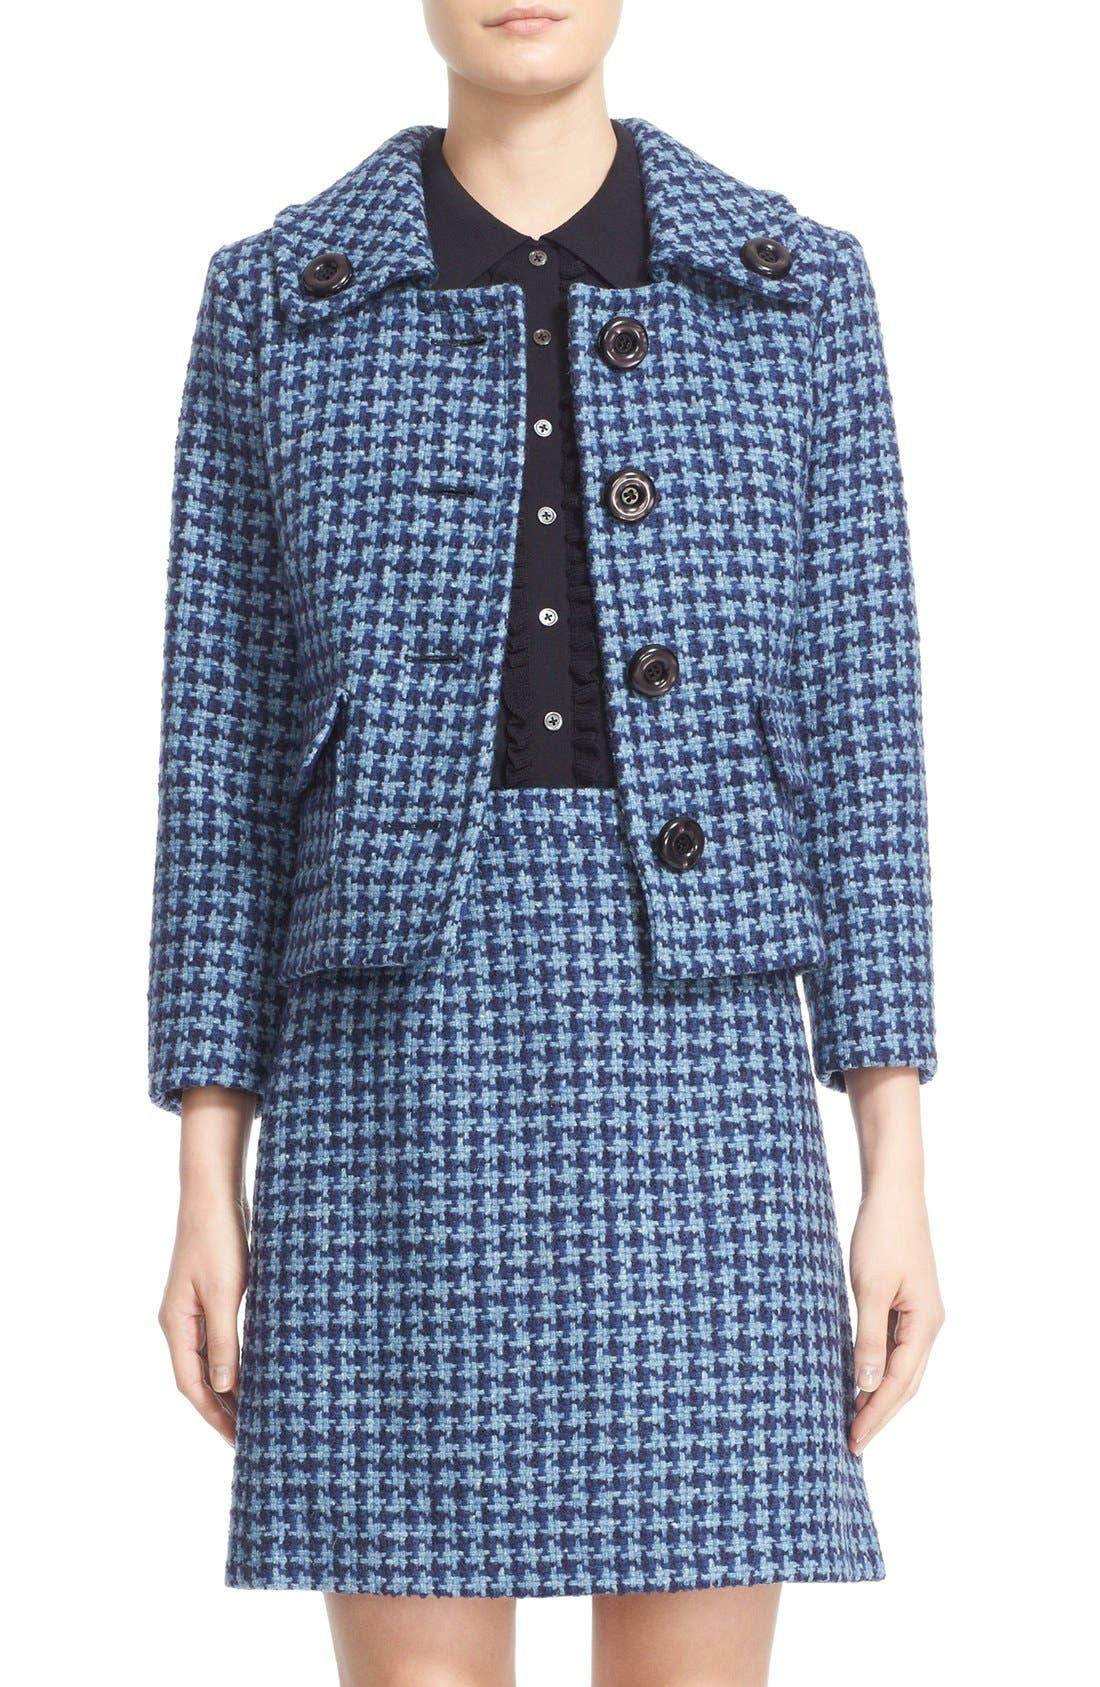 Main Image - Michael Kors Houndstooth Tweed Jacket